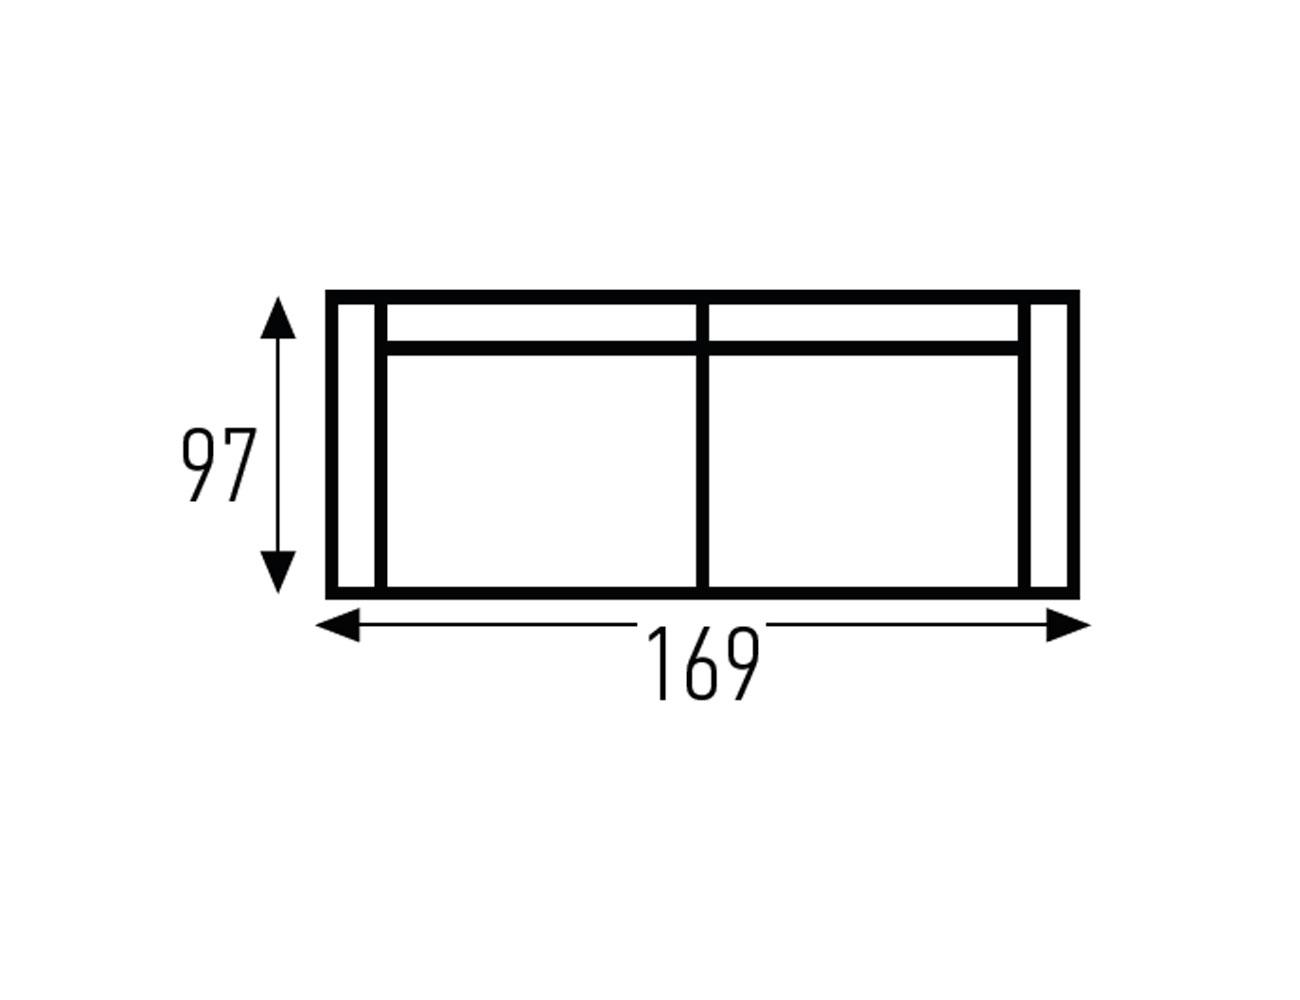 Croquis sofa 3 plaza 1691